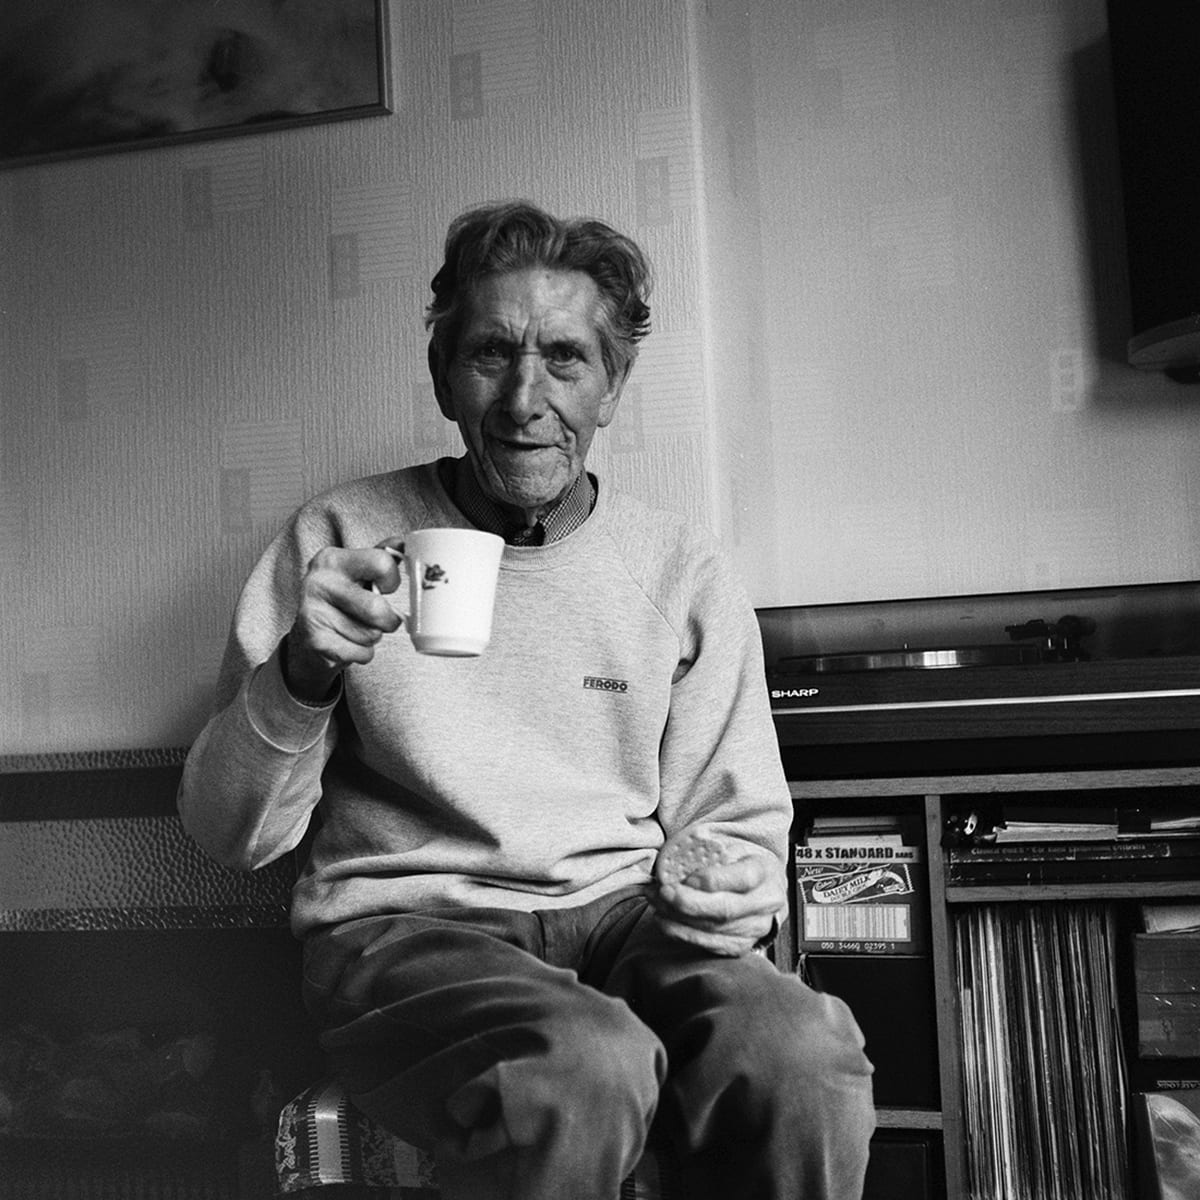 Black and white photograph of man holding a mug.